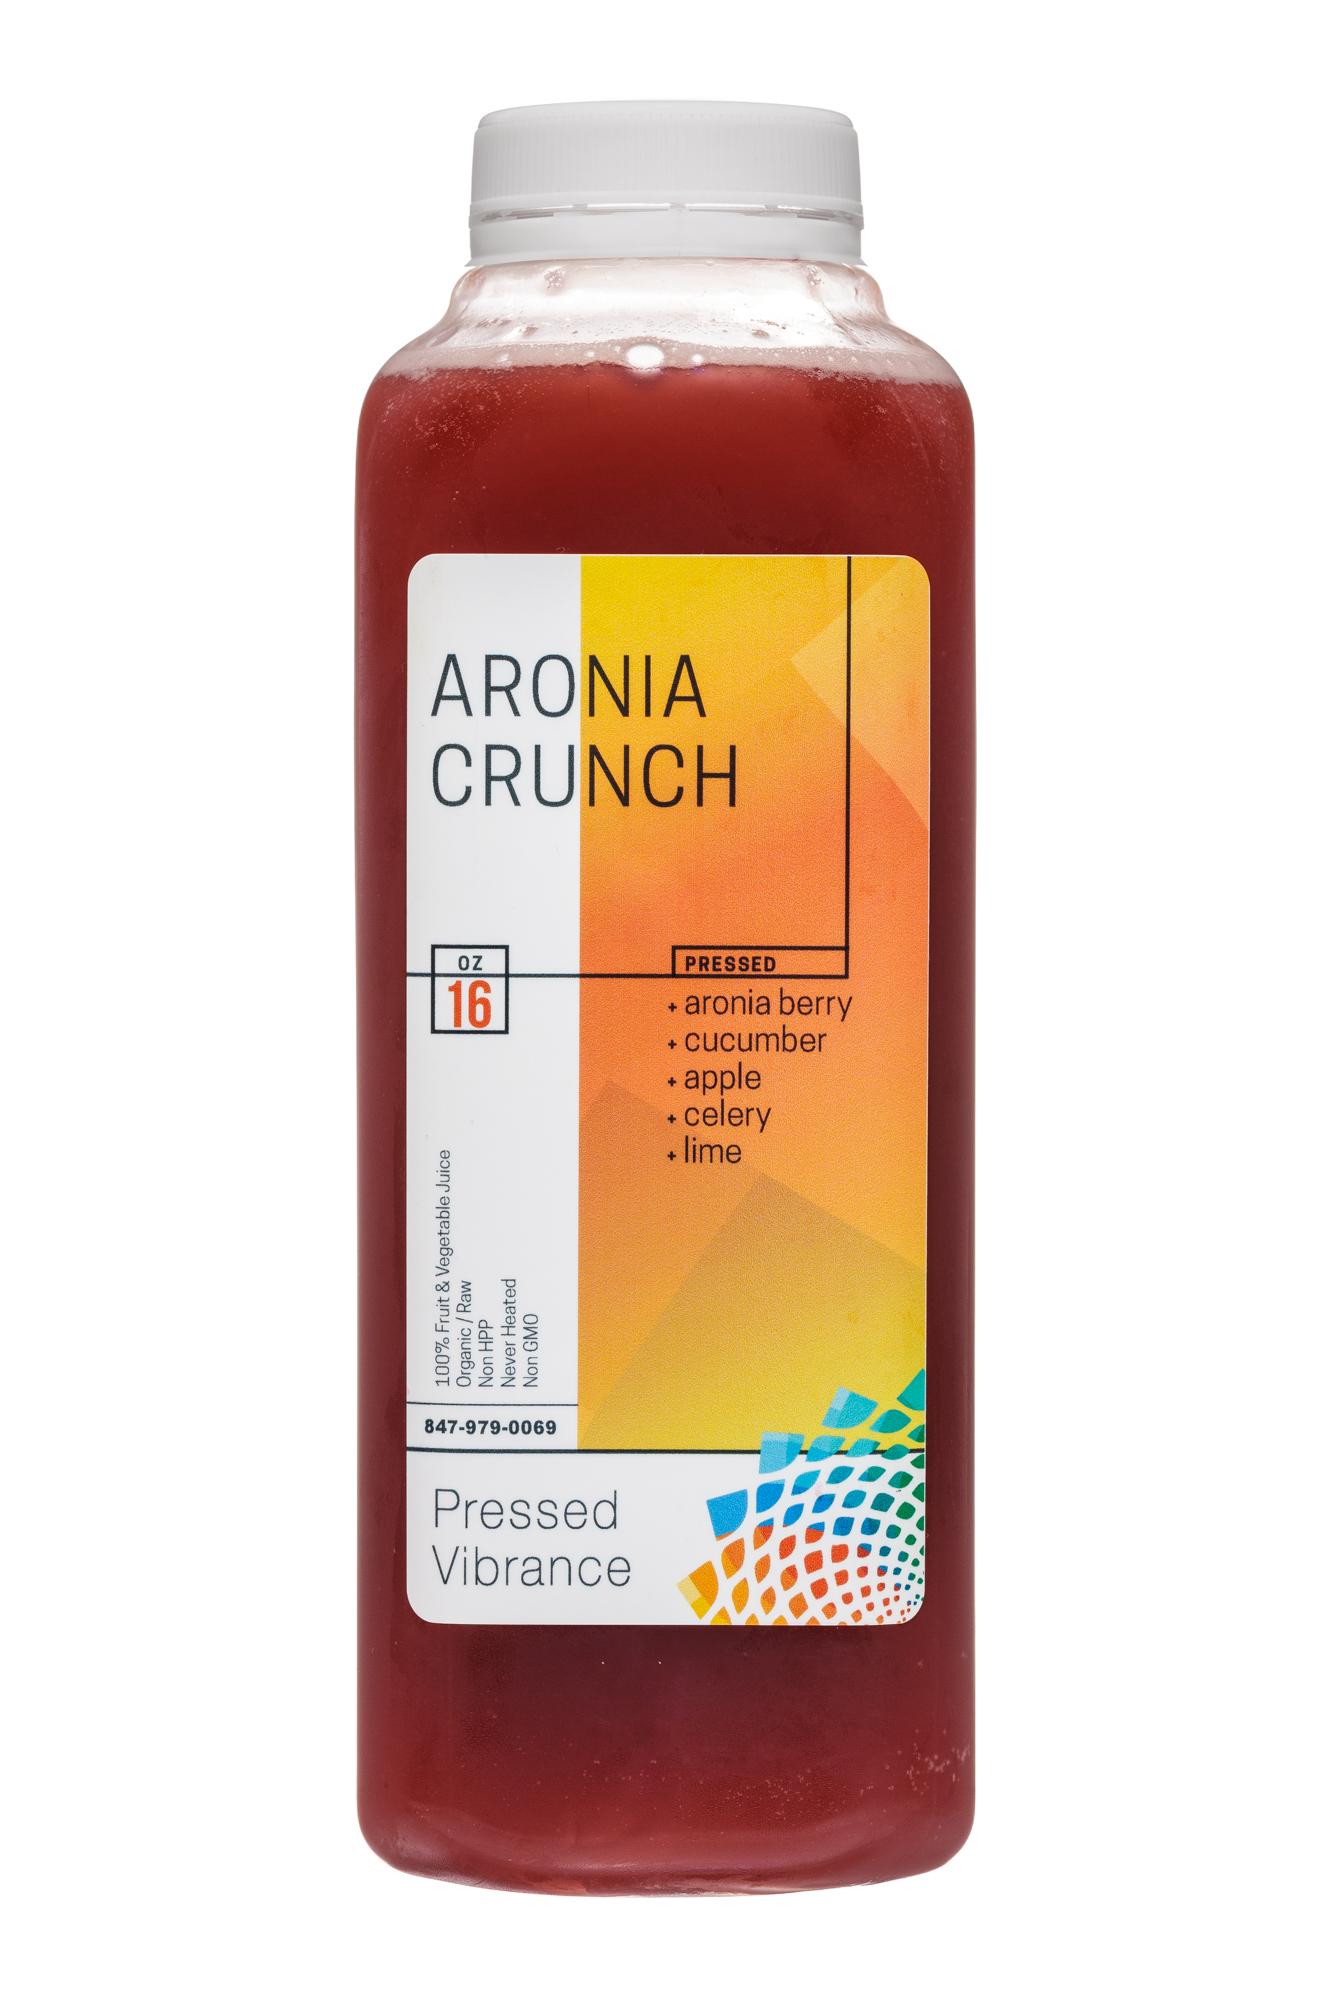 Aronia Crunch